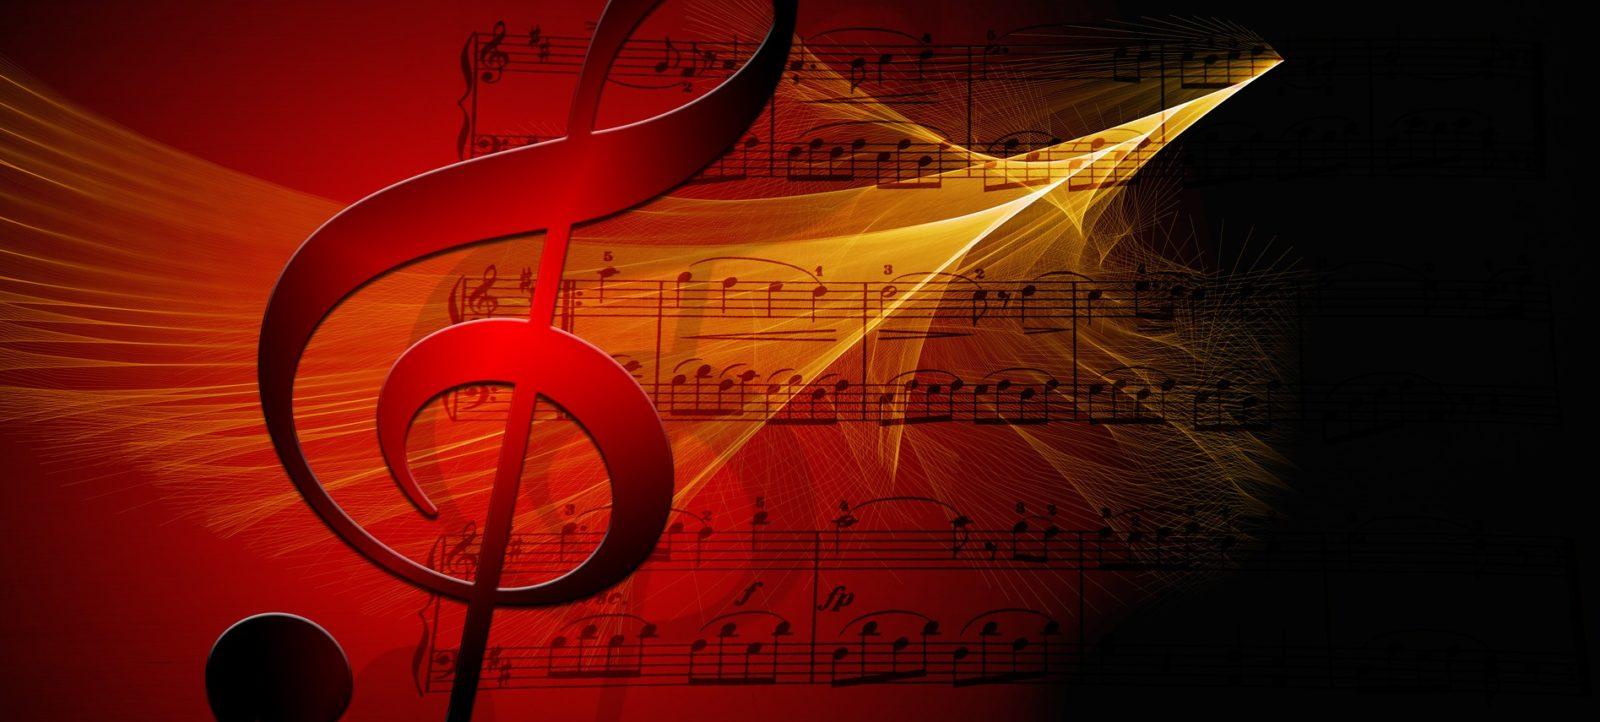 Úton a zene – Paks